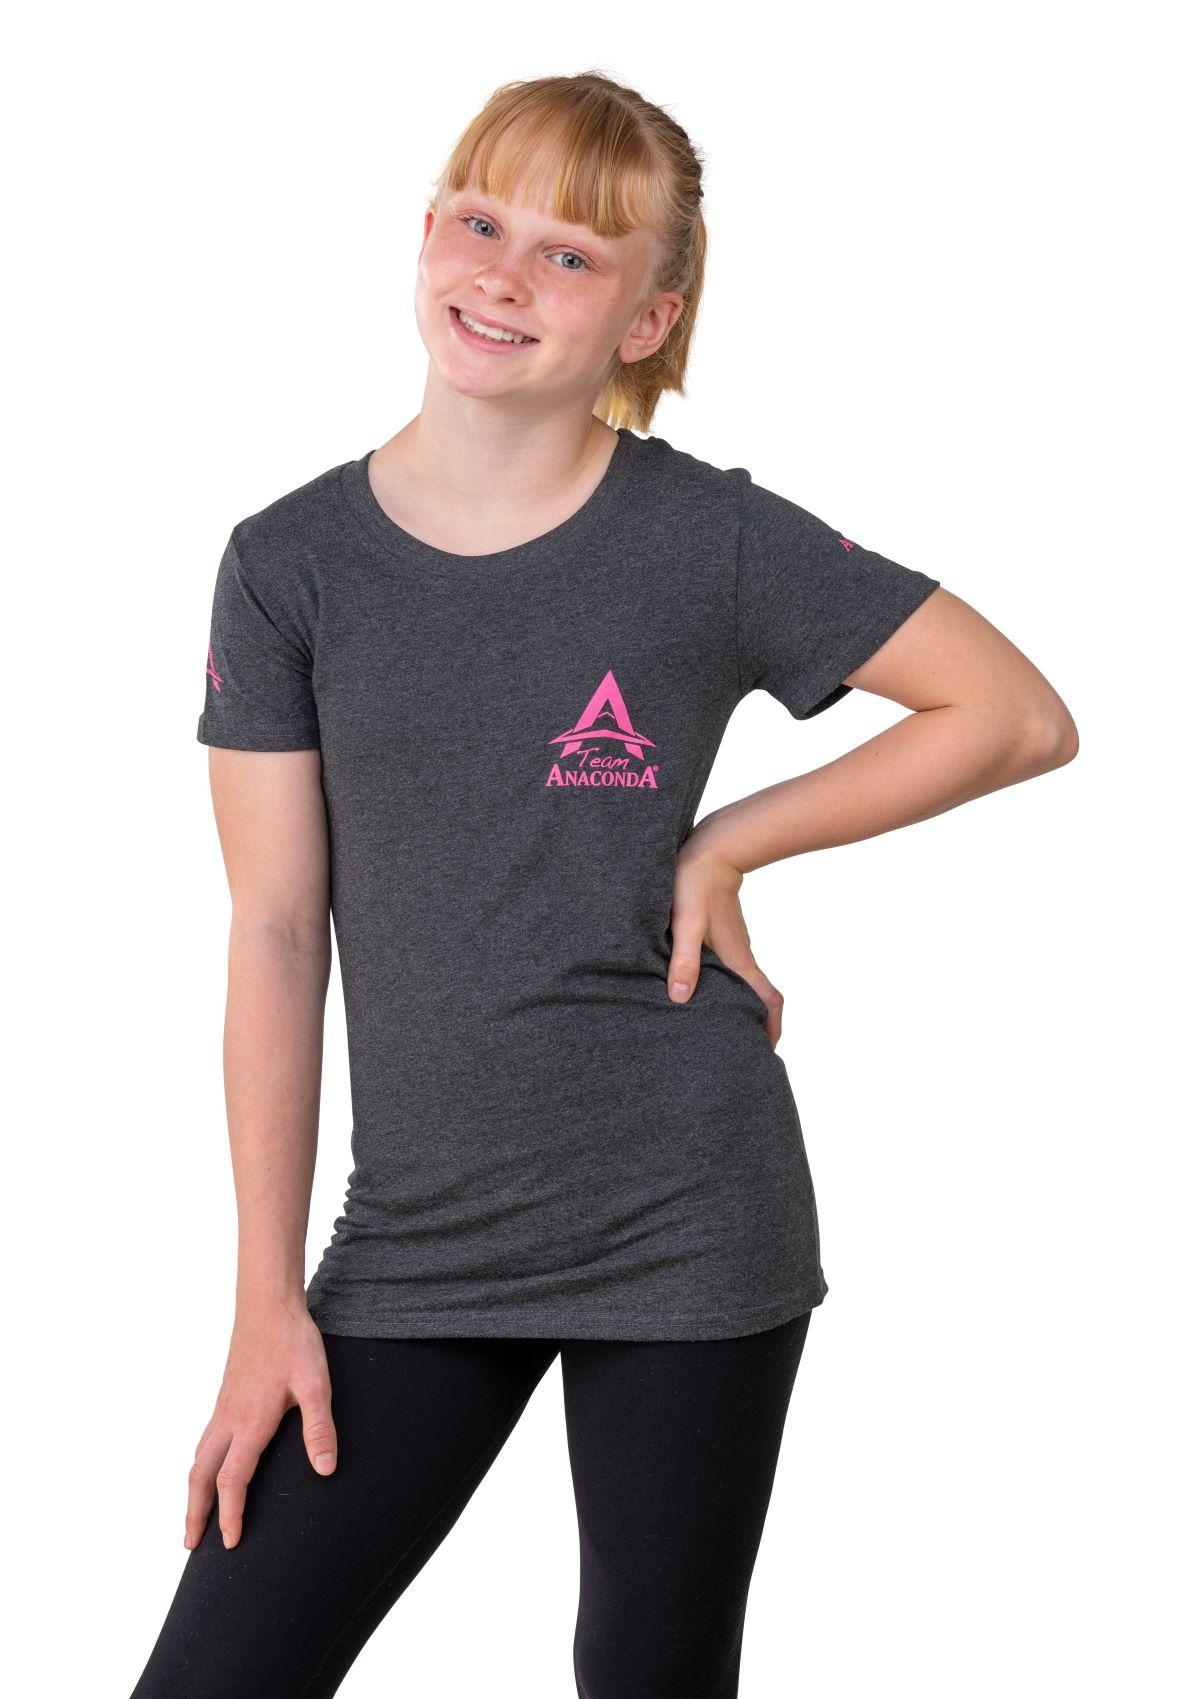 Anaconda dámské tričko Lady Team XXS